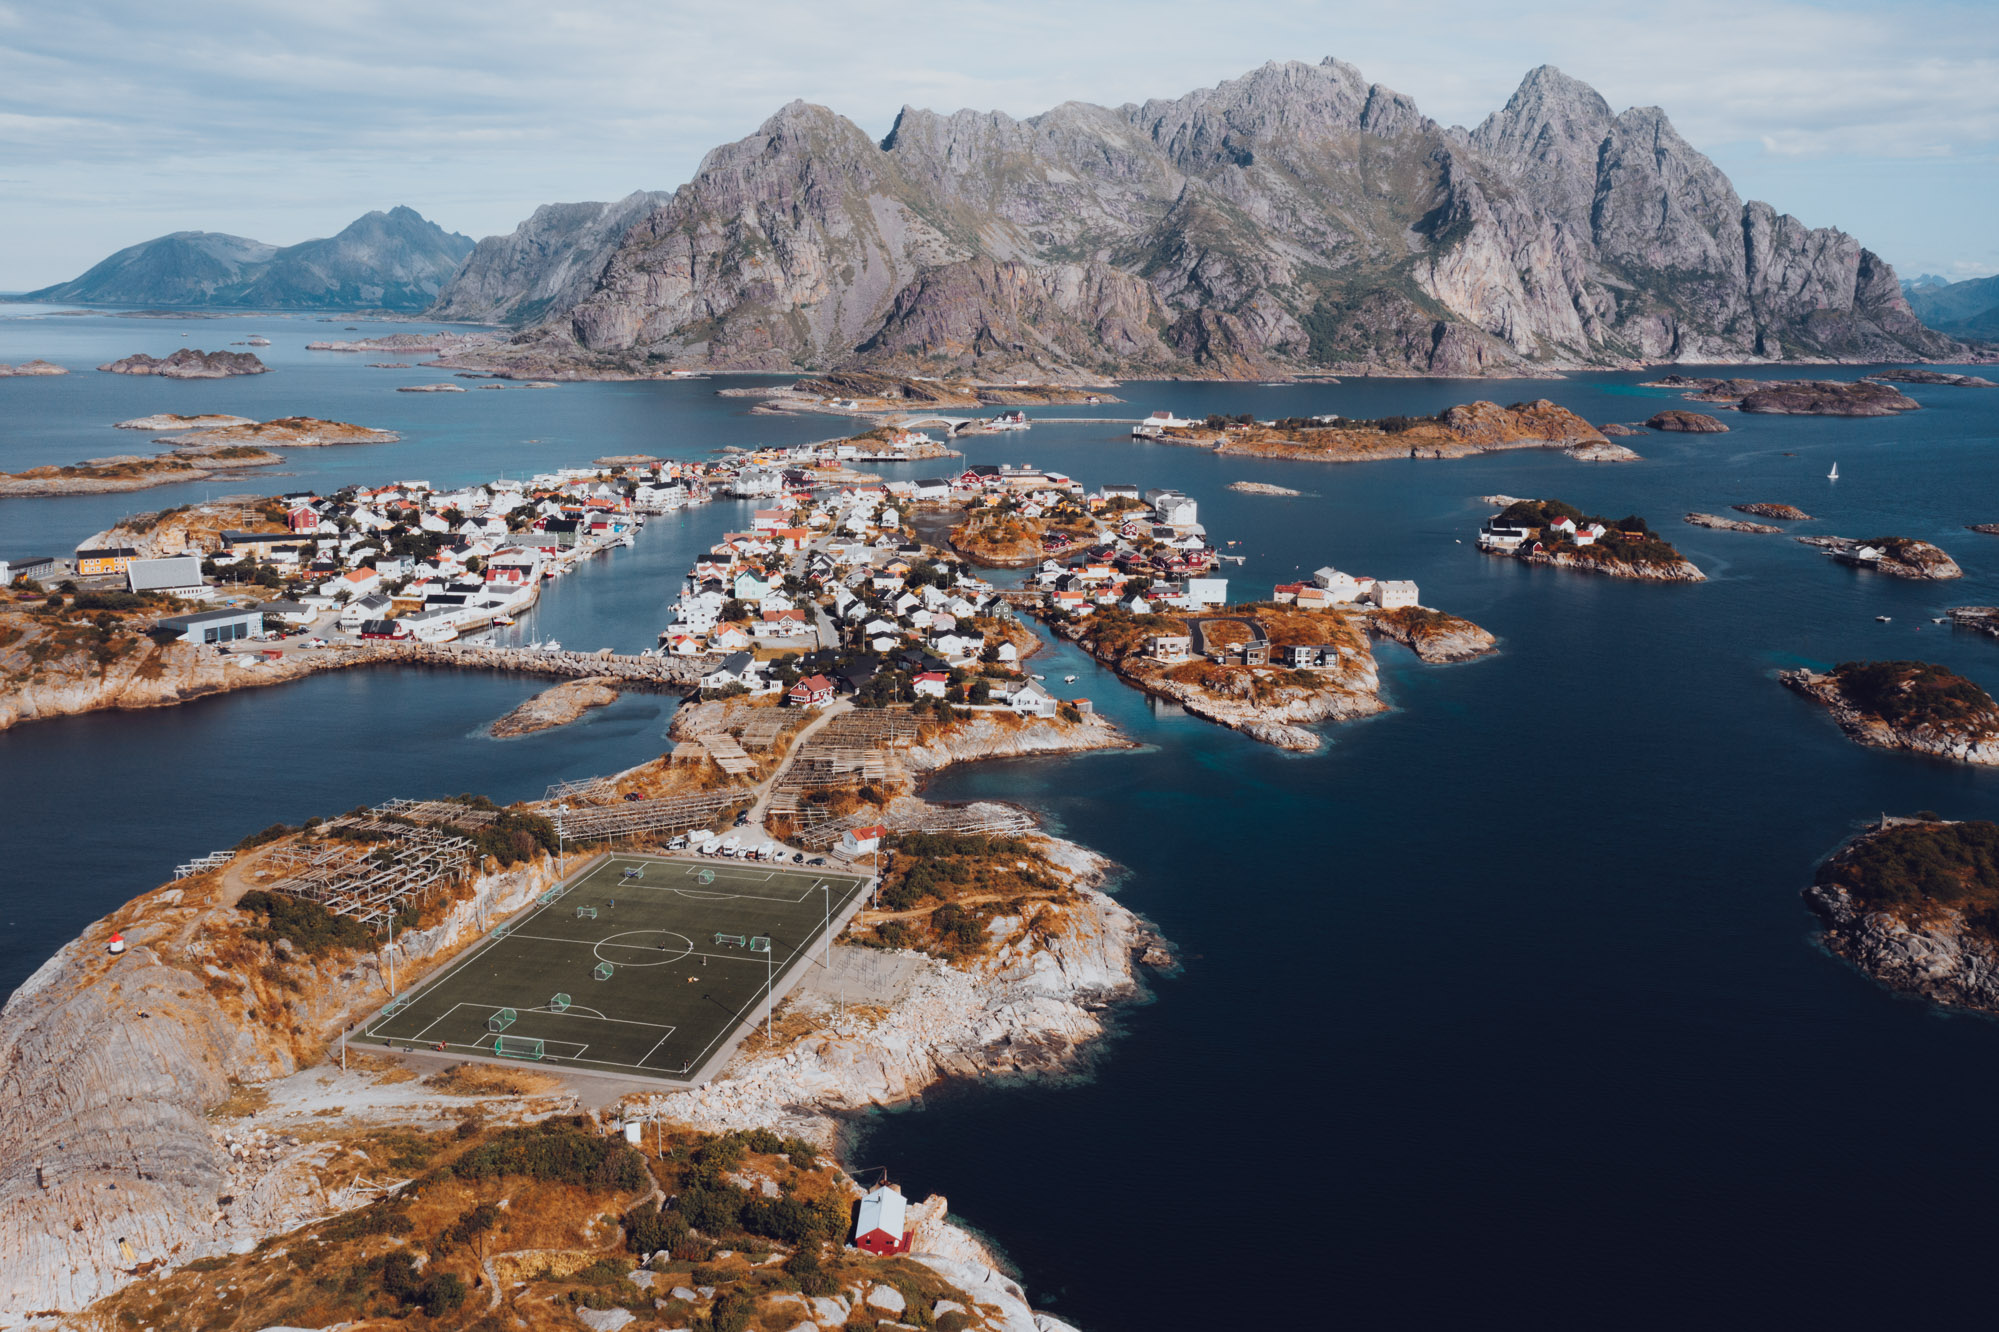 Drone photo of Henningsvær town in Lofoten Norway